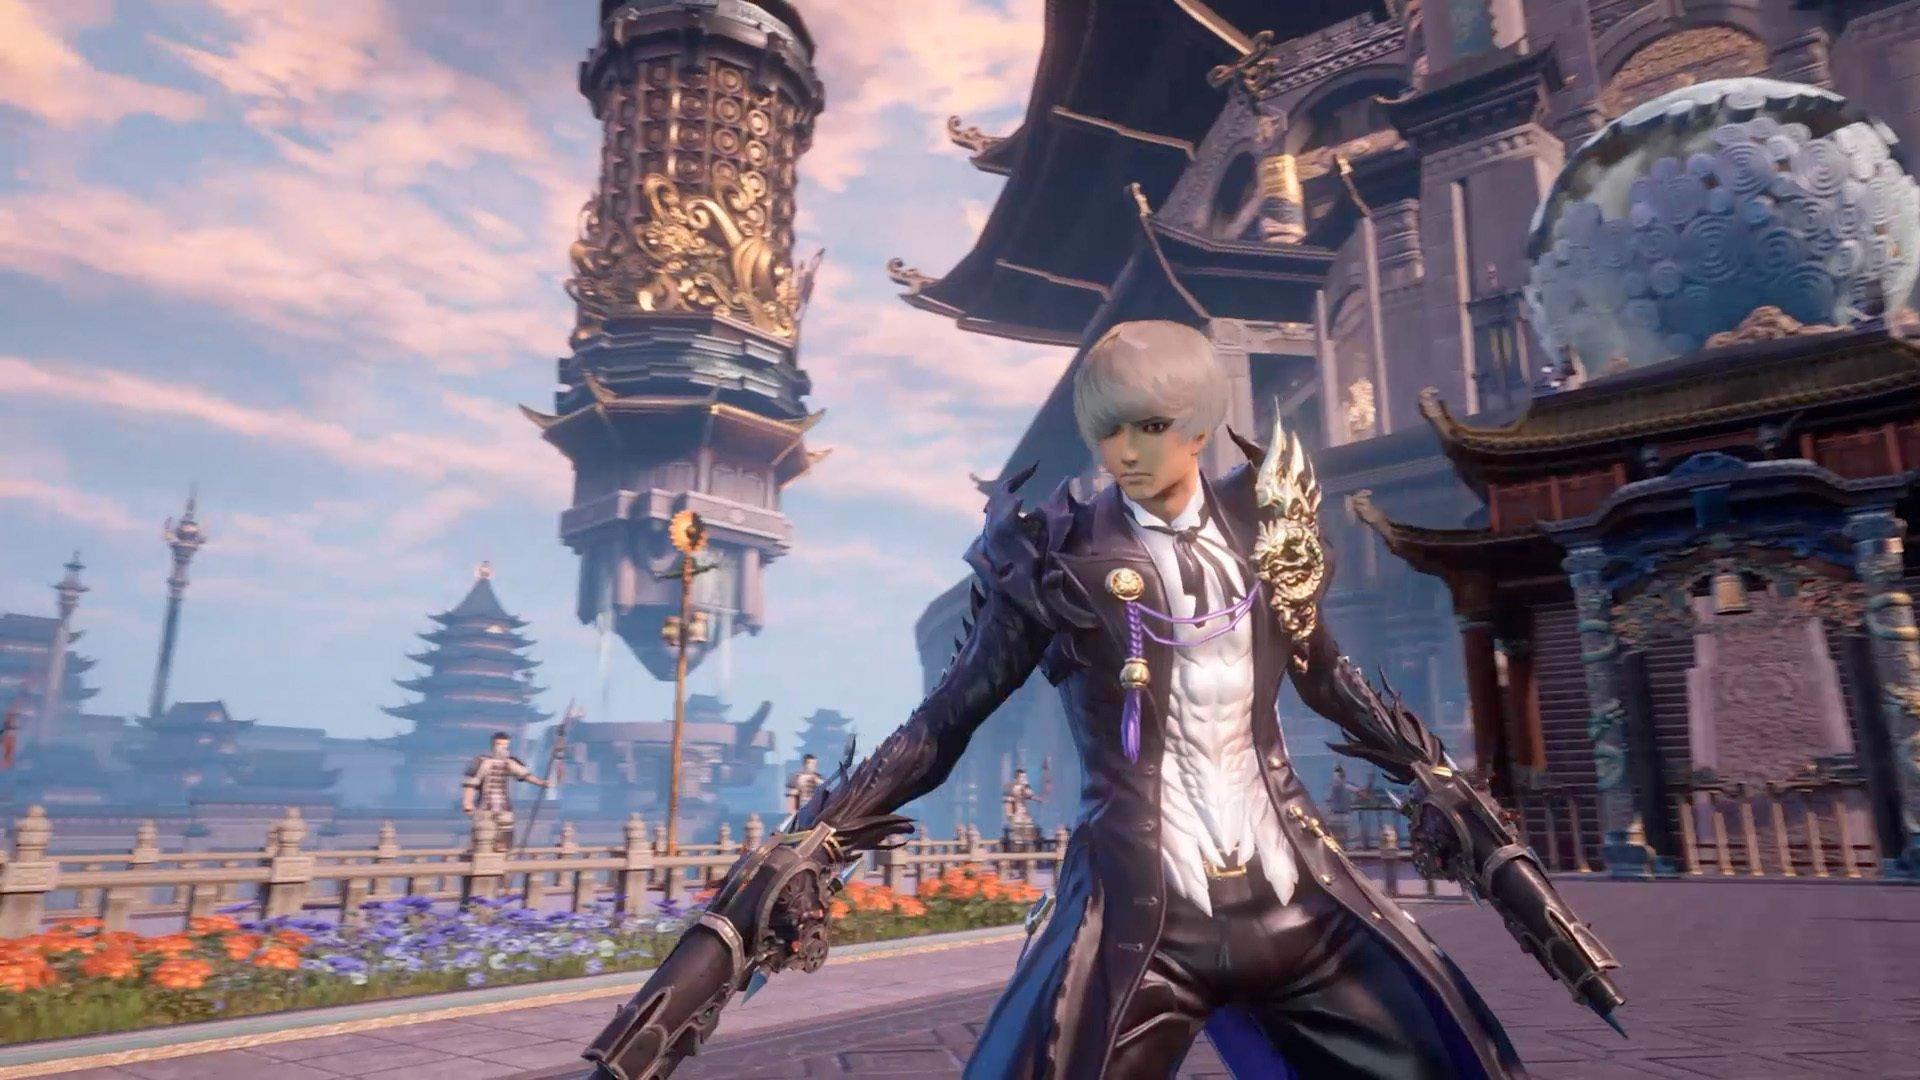 Blade & Soul Unreal Engine 4 release